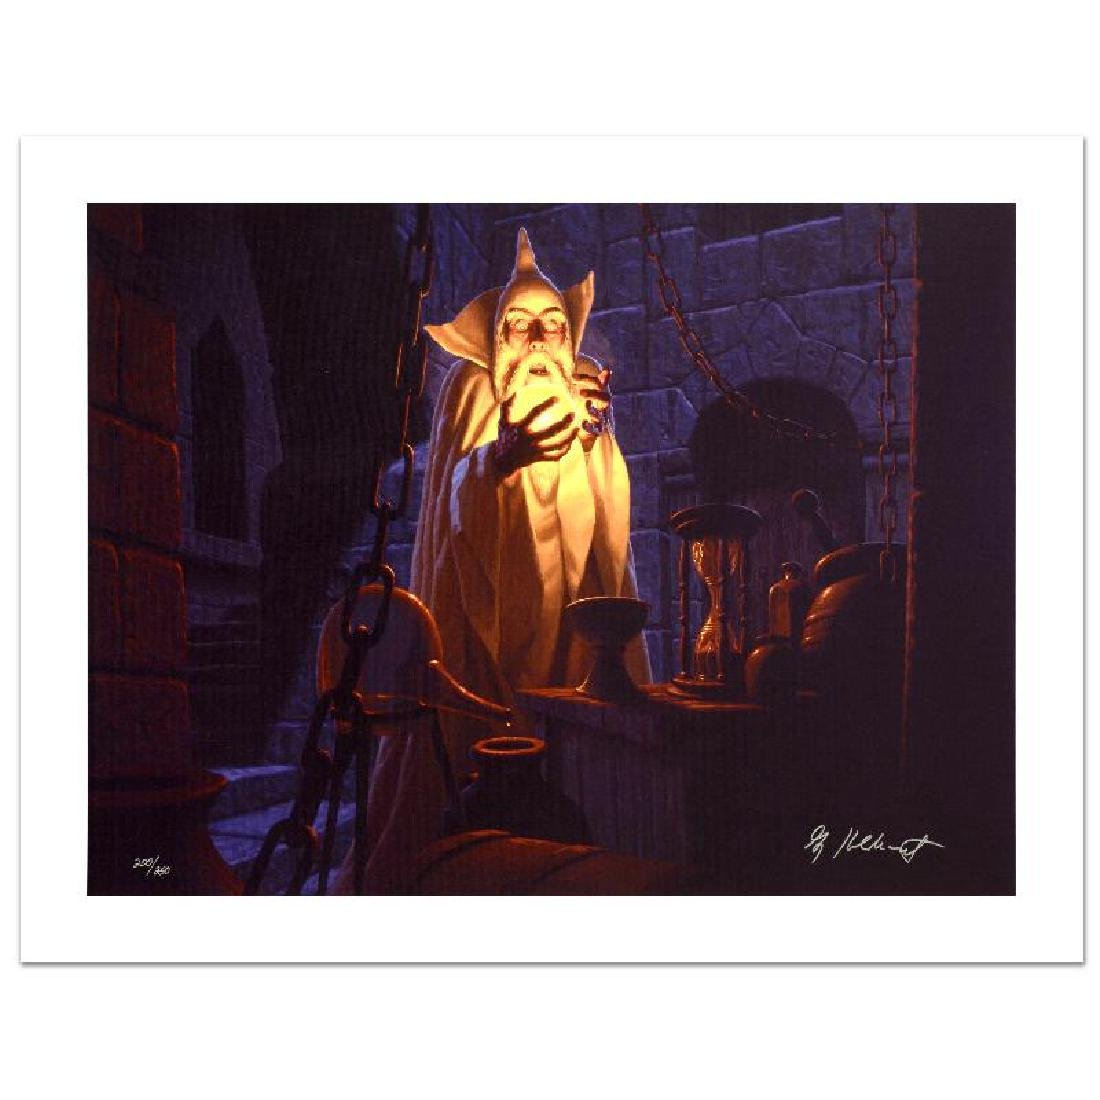 """Saruman And The Palantir"" Limited Edition Giclee on"